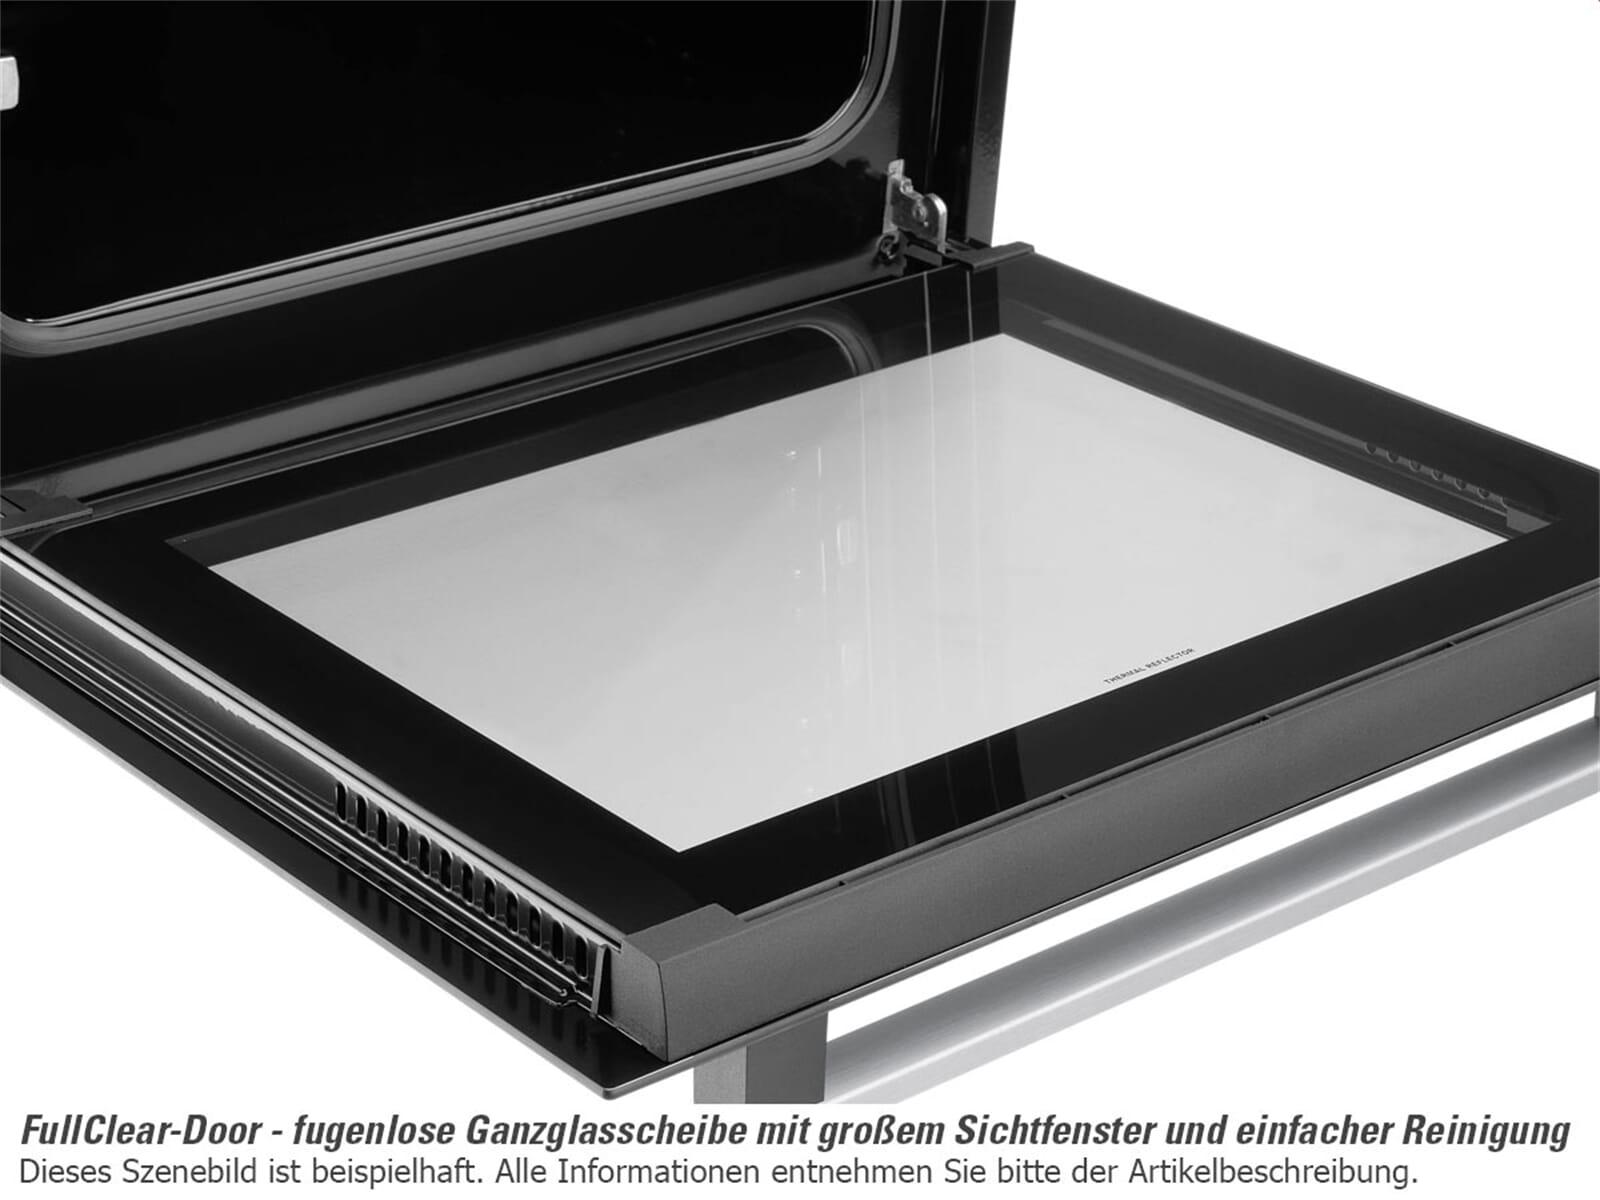 Oranier EBP 9872 - 9872 15 Pyrolyse Backofen Schwarz